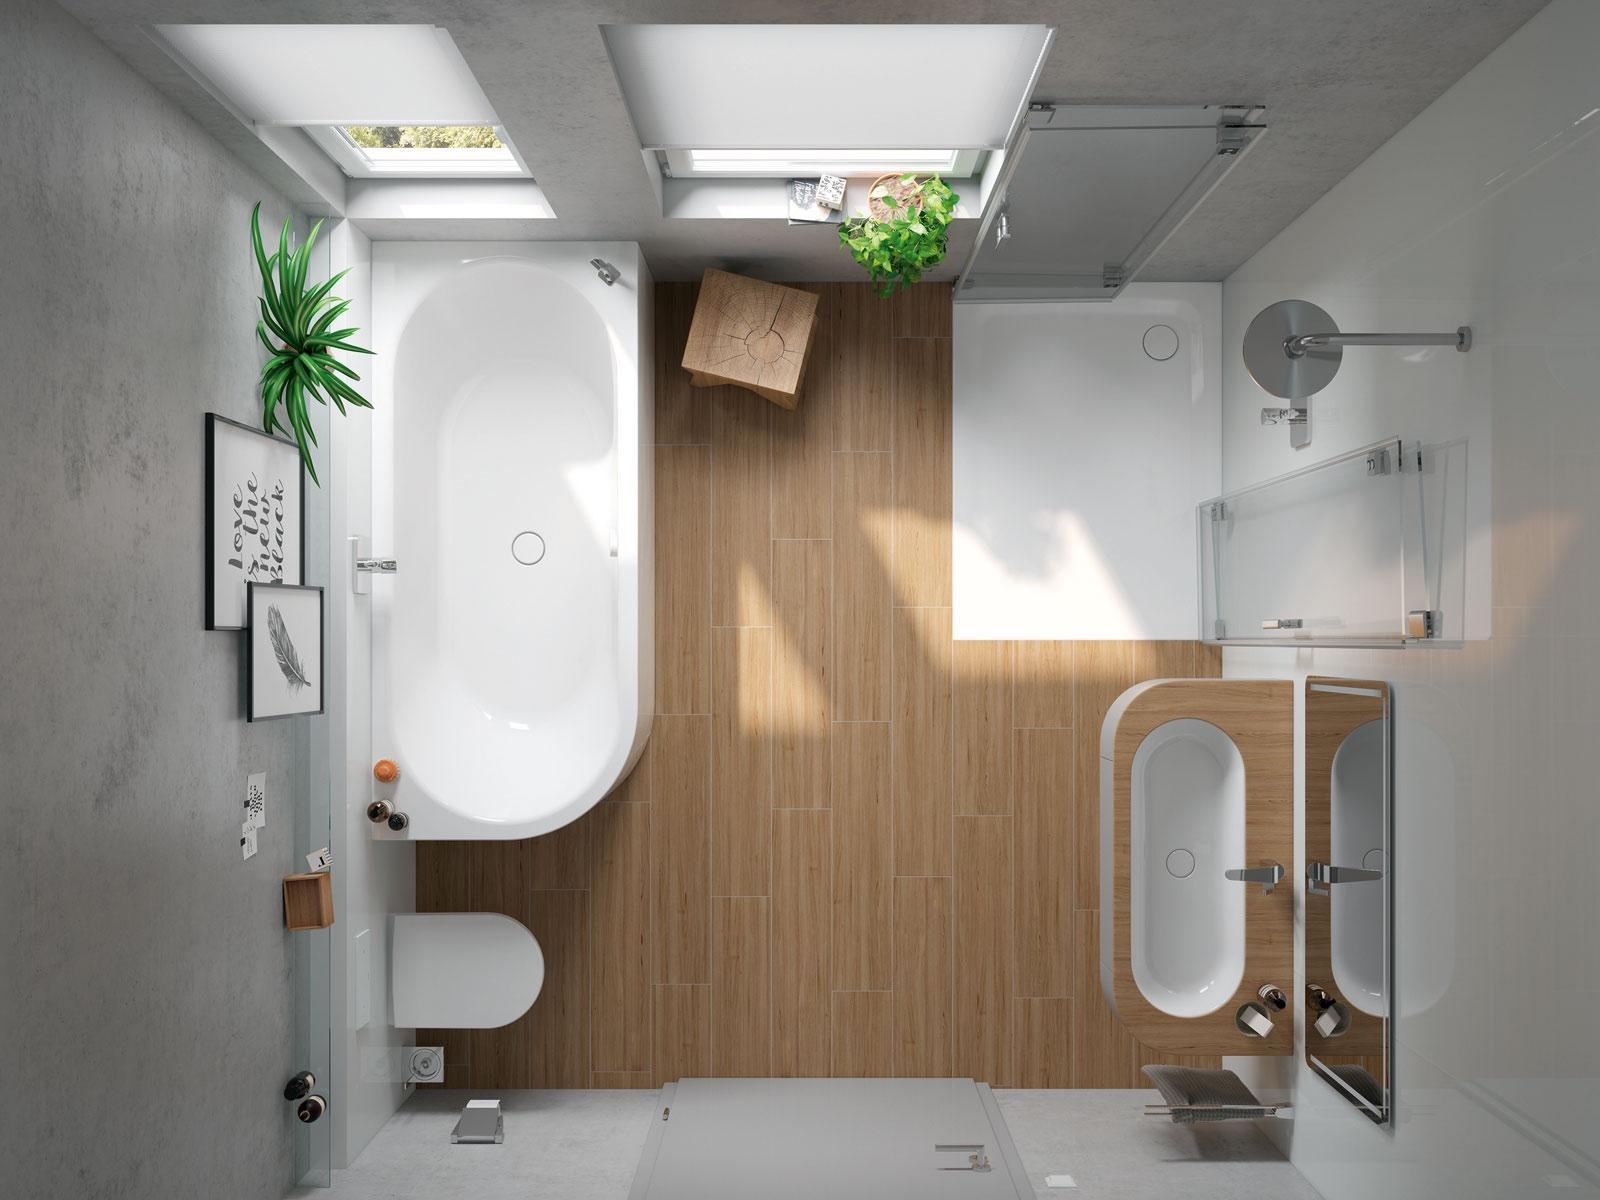 losungen fur kleine bader. Black Bedroom Furniture Sets. Home Design Ideas